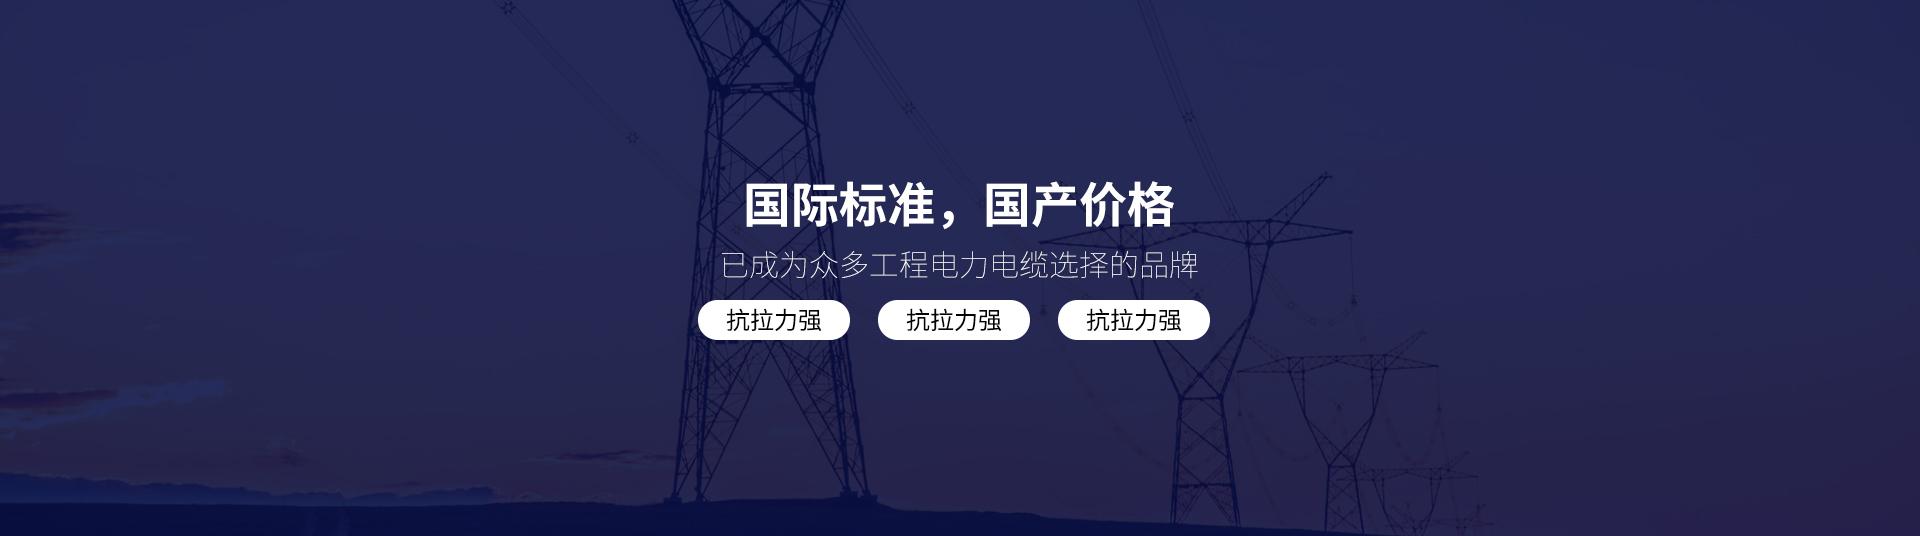 陕西电力电缆